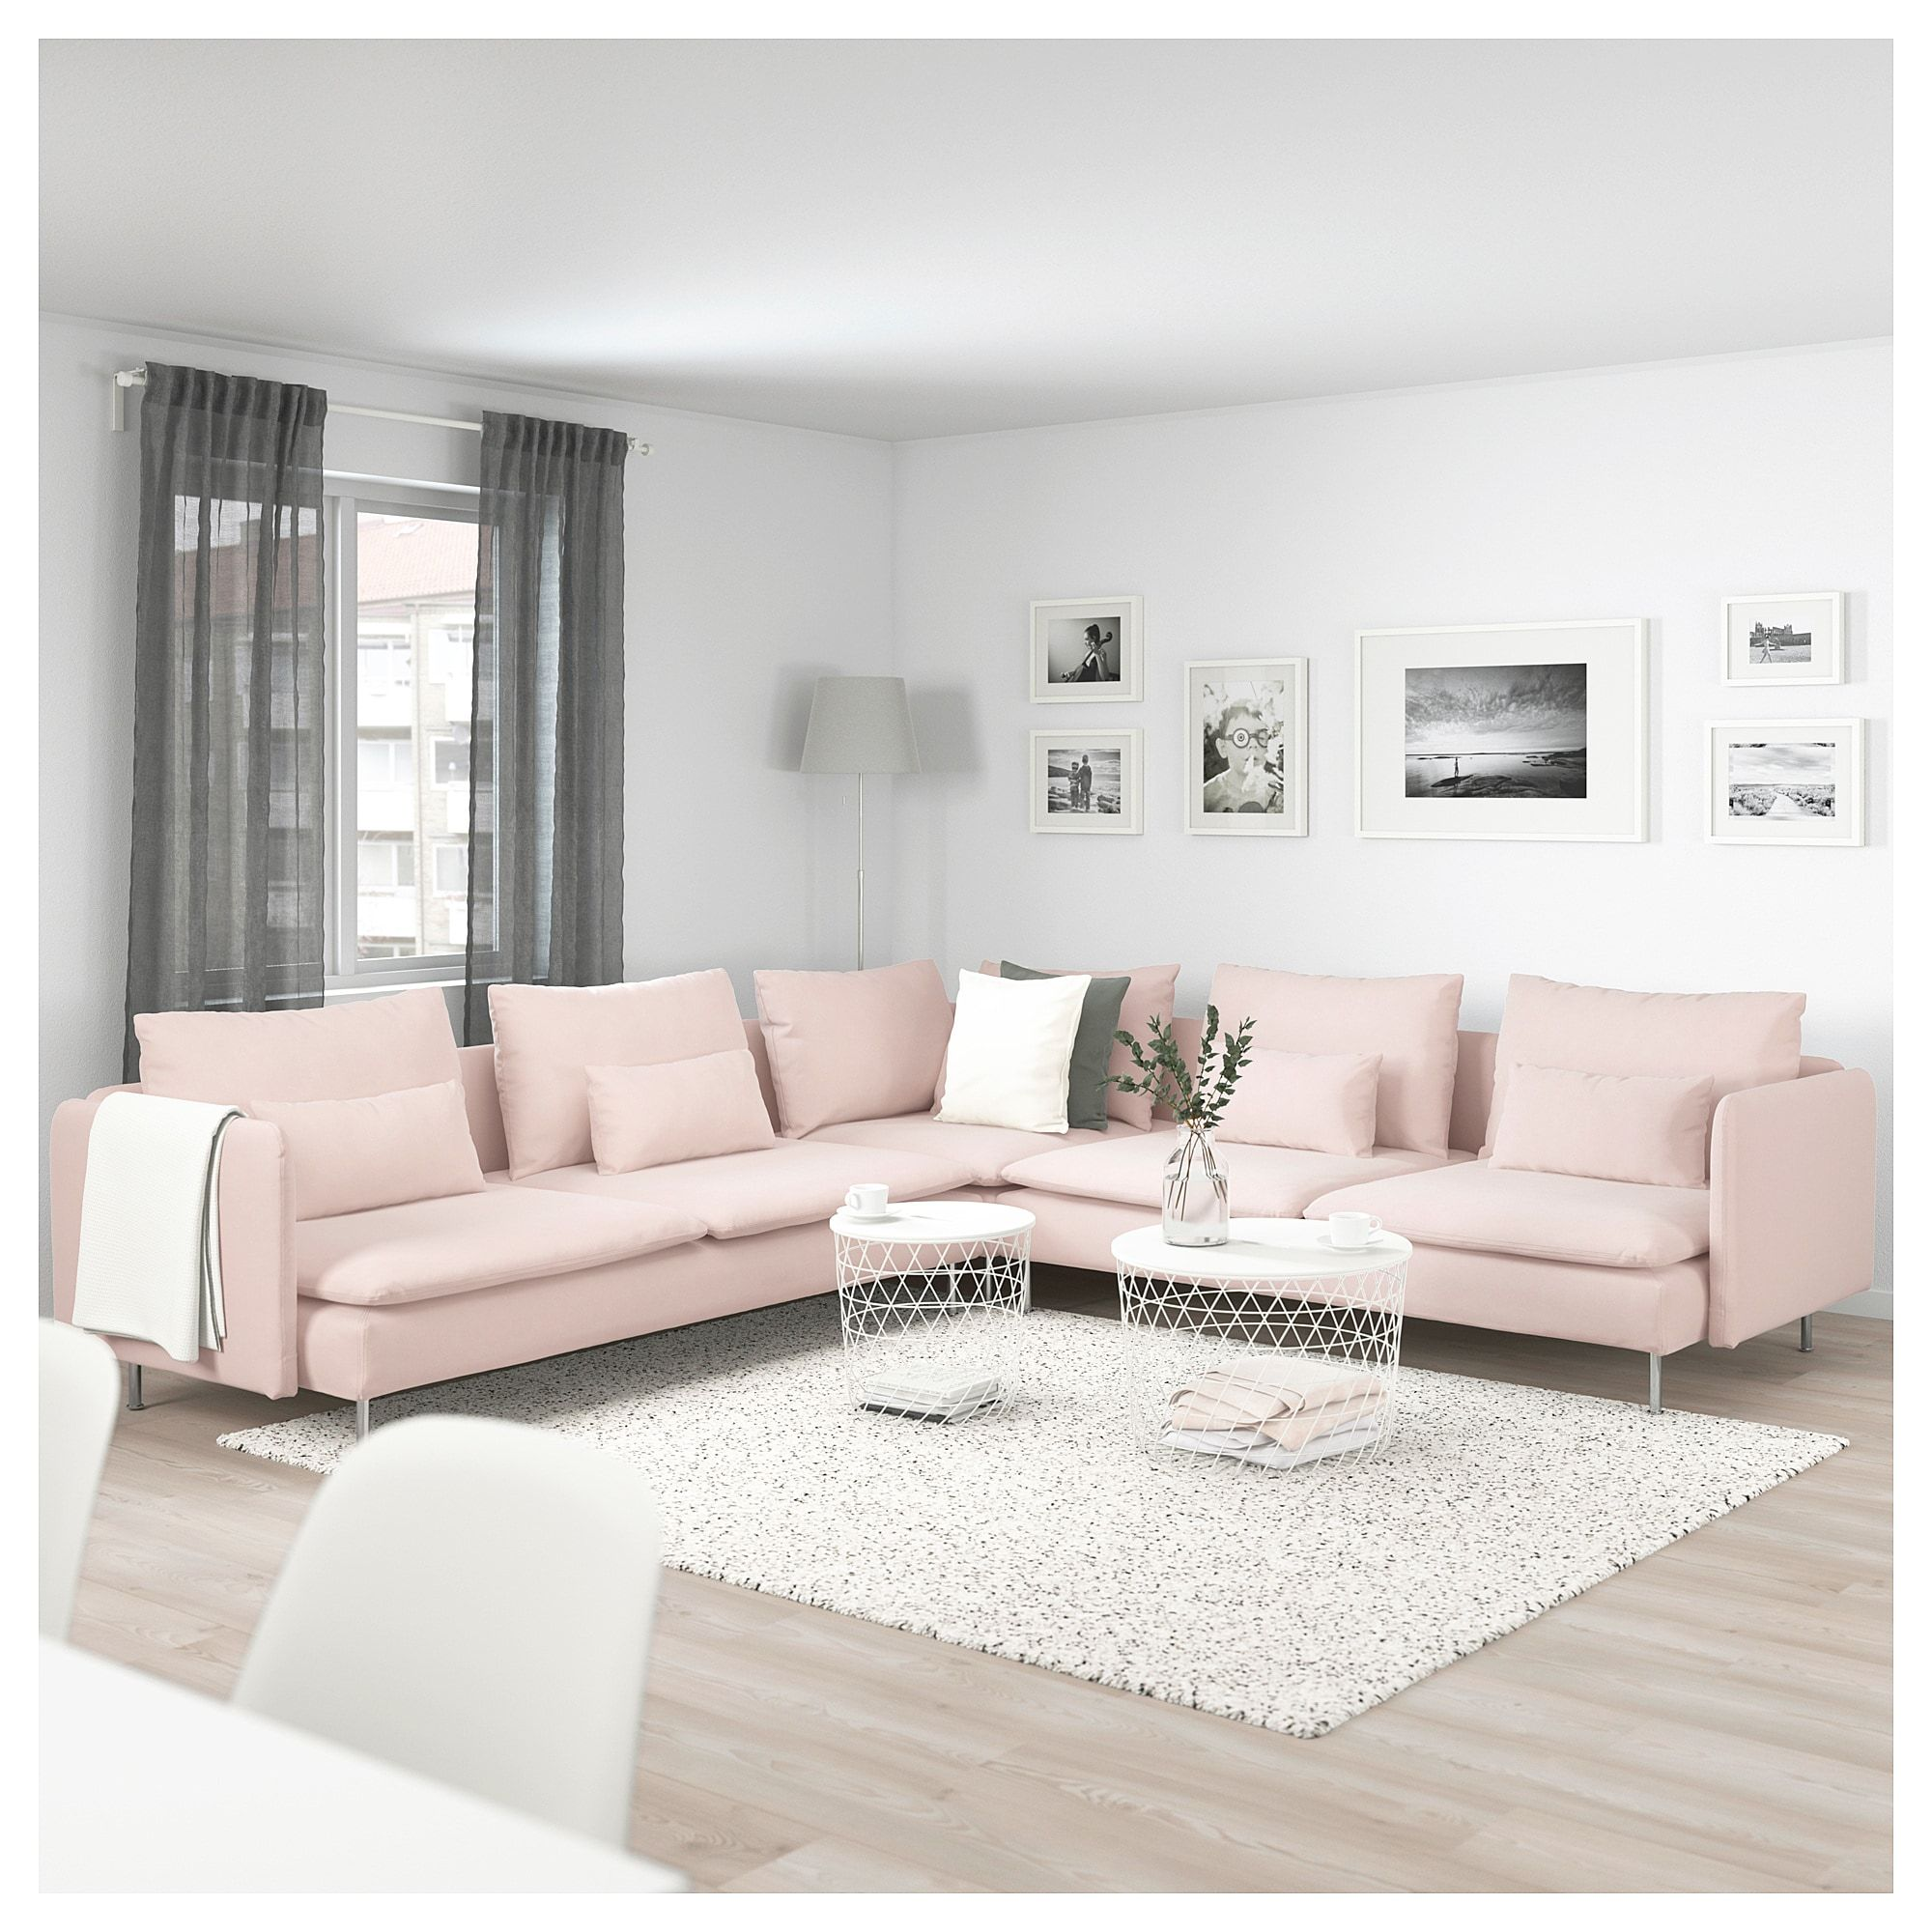 SÖDERHAMN Sectional, 5seat Samsta light pink IKEA